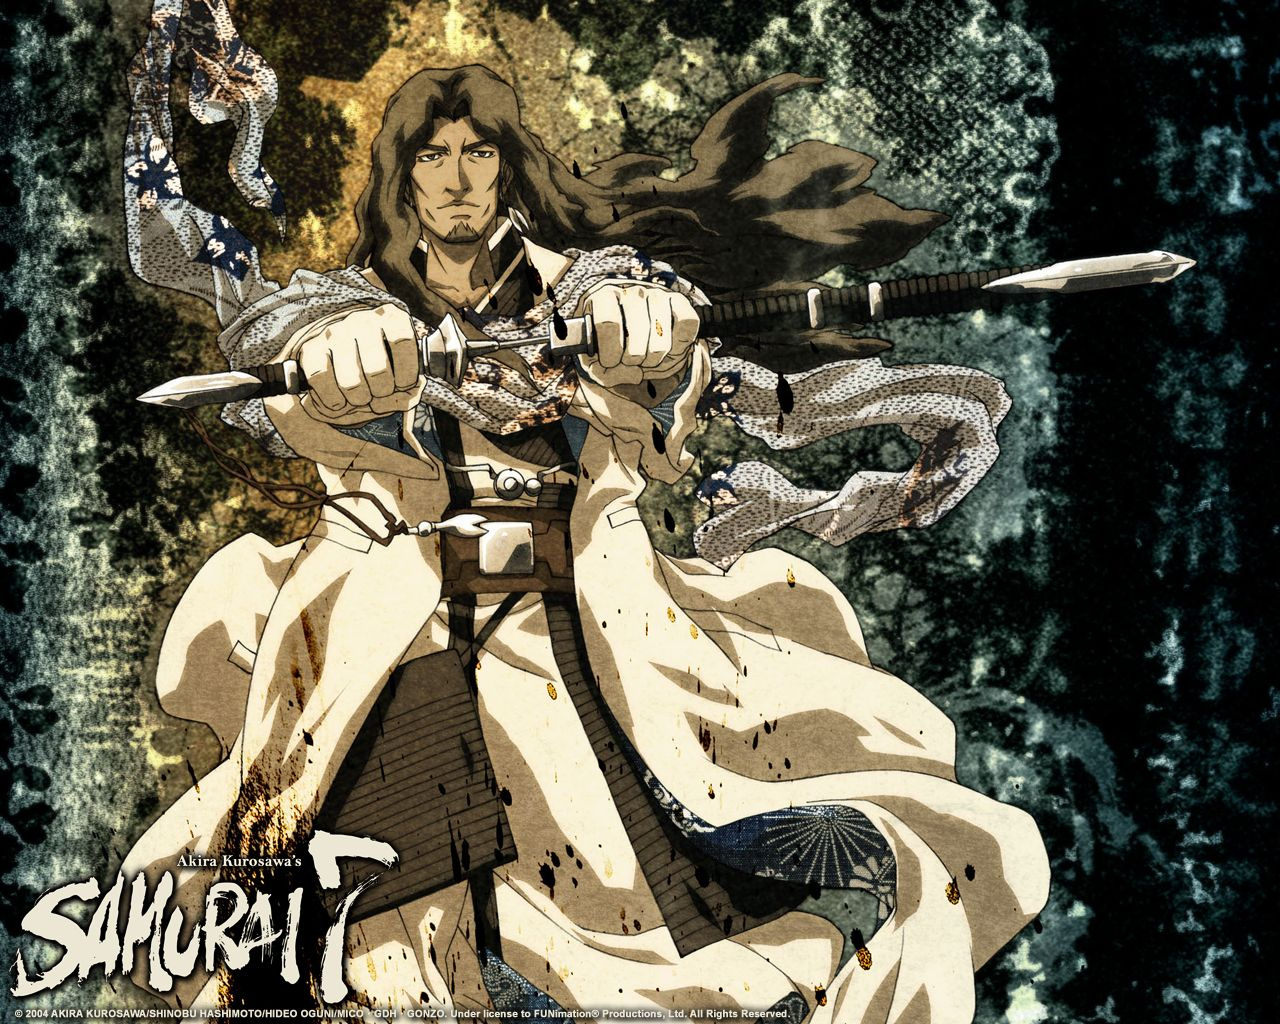 Samurai 7 Anime Characters : Shimada kanbe samurai image  zerochan anime